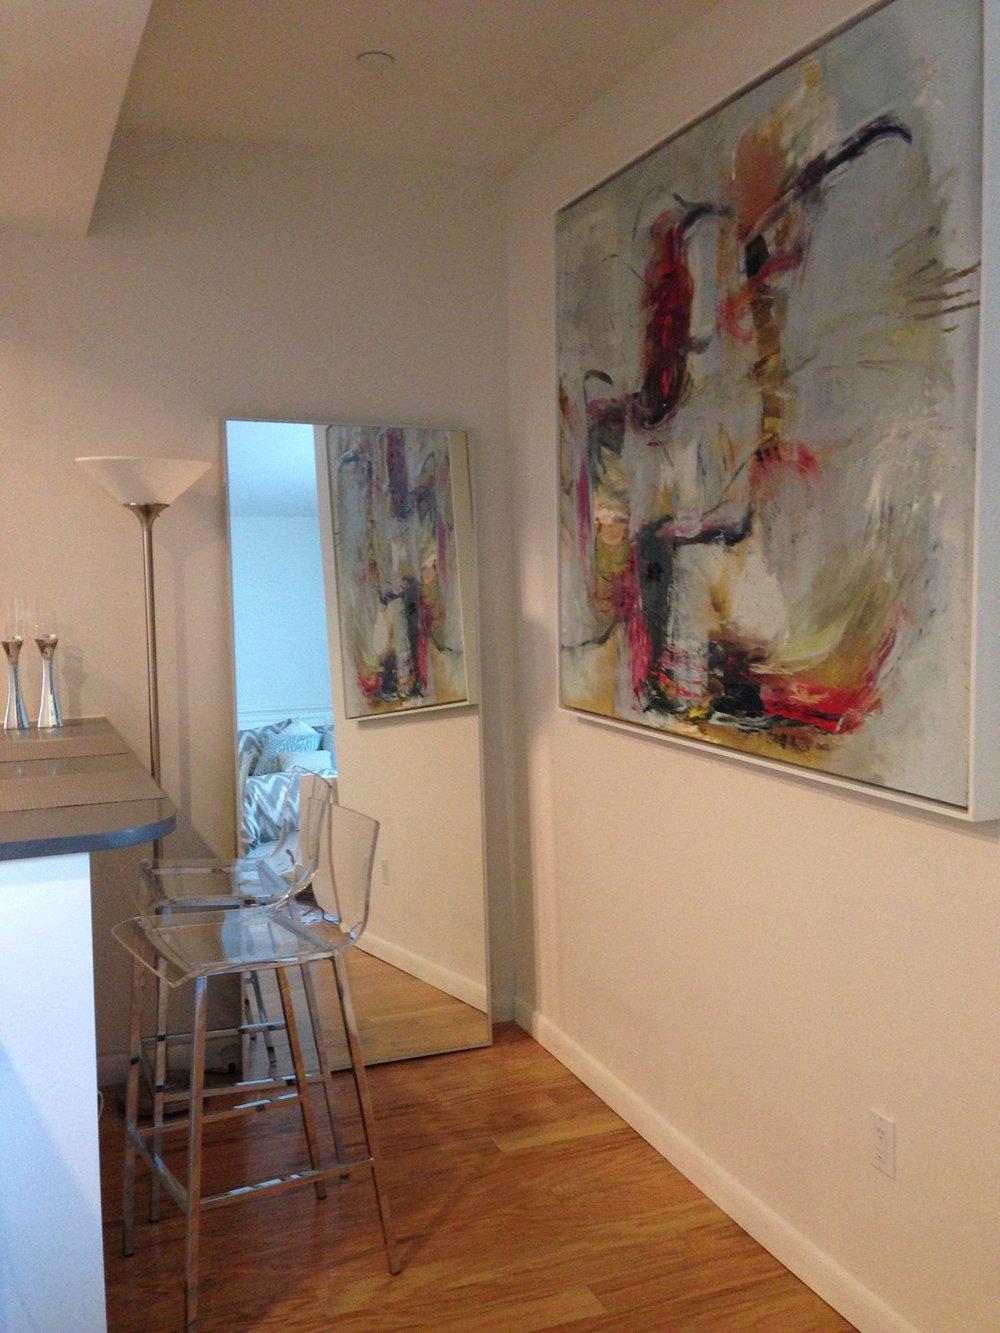 Machination, residential setting, Manhattan